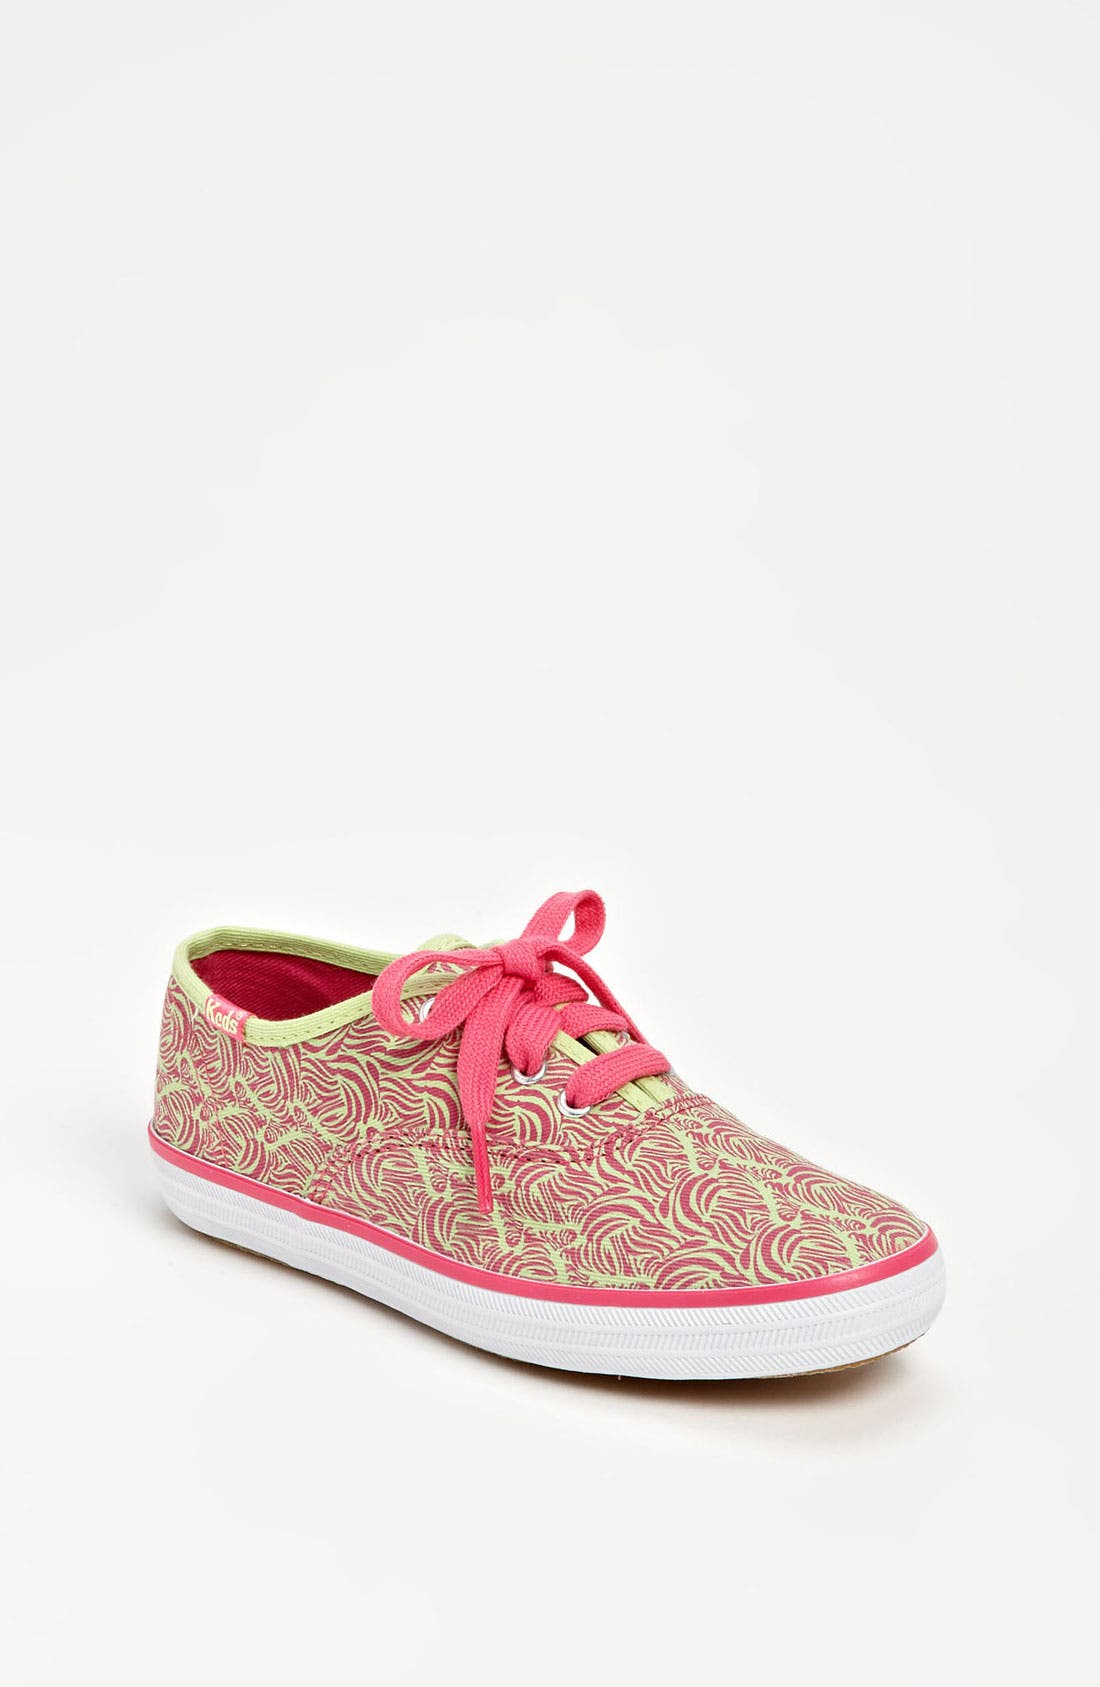 Main Image - Keds® 'Original Champion' Sneaker (Toddler, Little Kid & Big Kid)